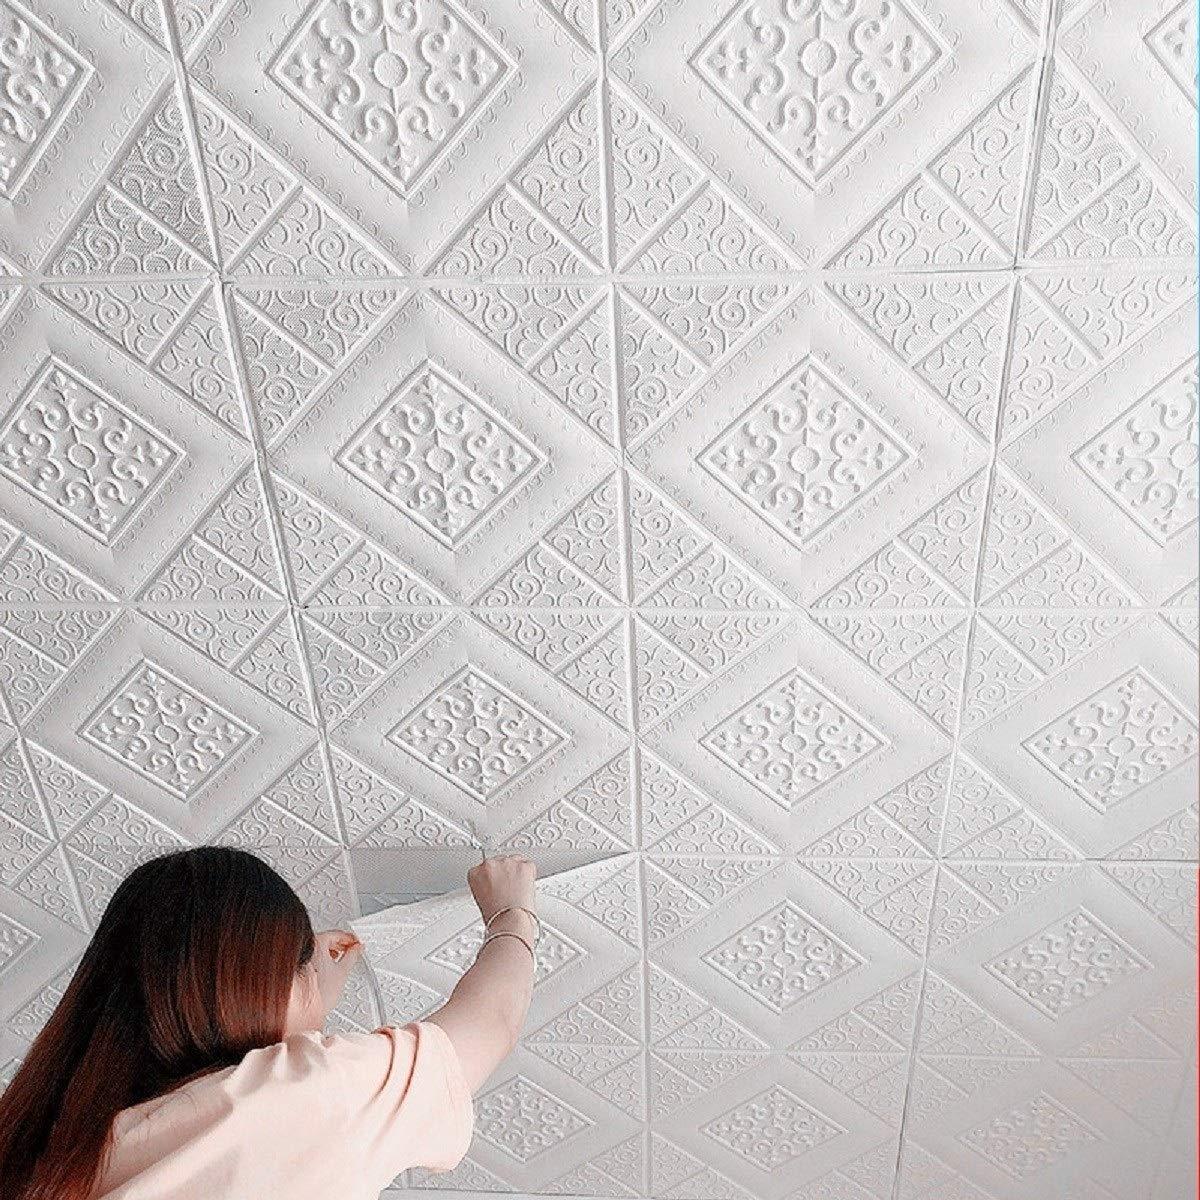 Nasmodo Foam Wall 3d Ceiling Wallpaper Tiles Panel Vinyl Stickers Self Adhesive For Home Living Room Bedroom Wall Panels 70 X 70 Cm 4 Diamond Buy Online In Pakistan At Desertcart Pk Productid 228332039